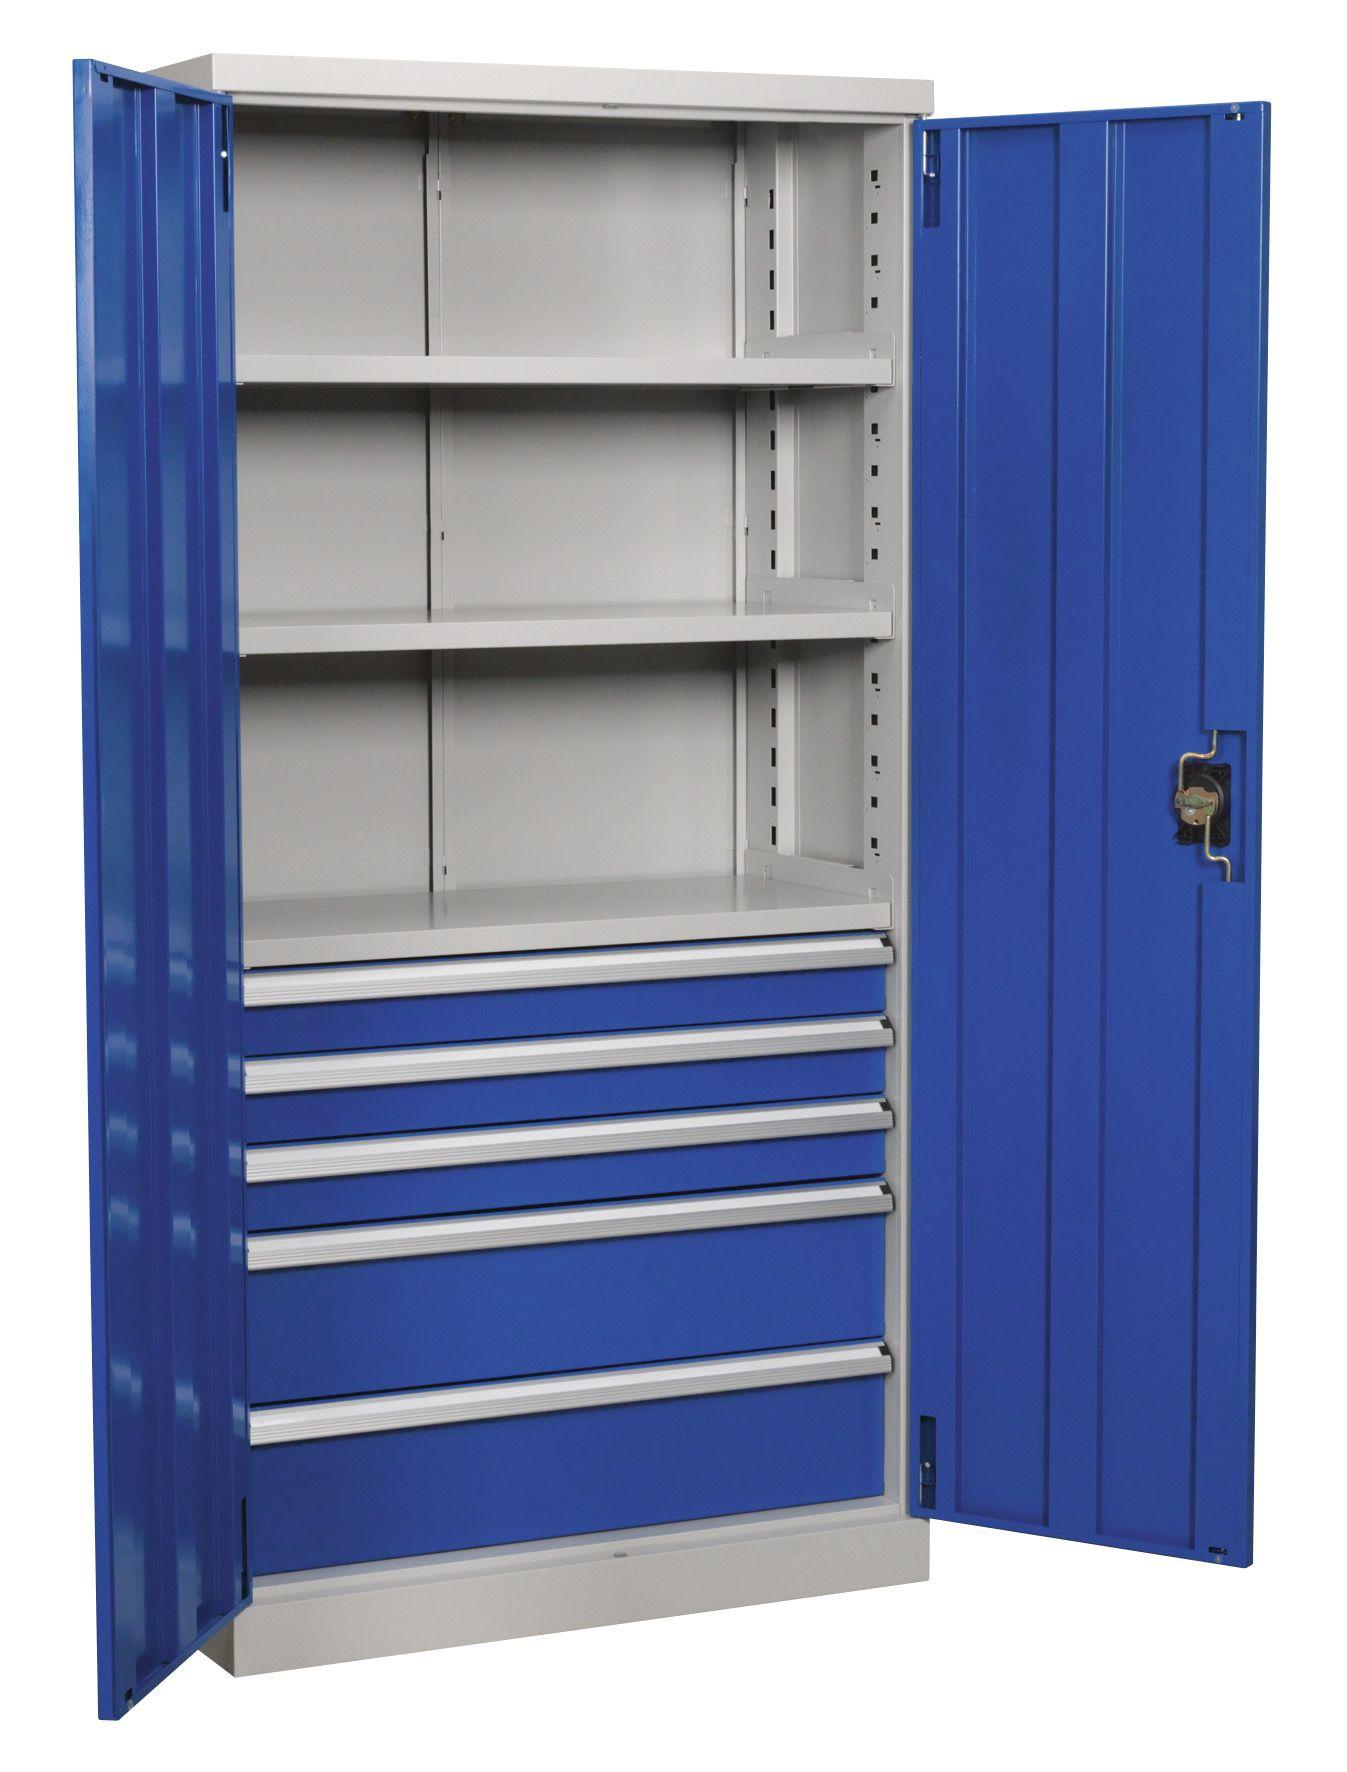 Sealey Industrial Cabinet 5 Drawer 3 Shelf 1800mm